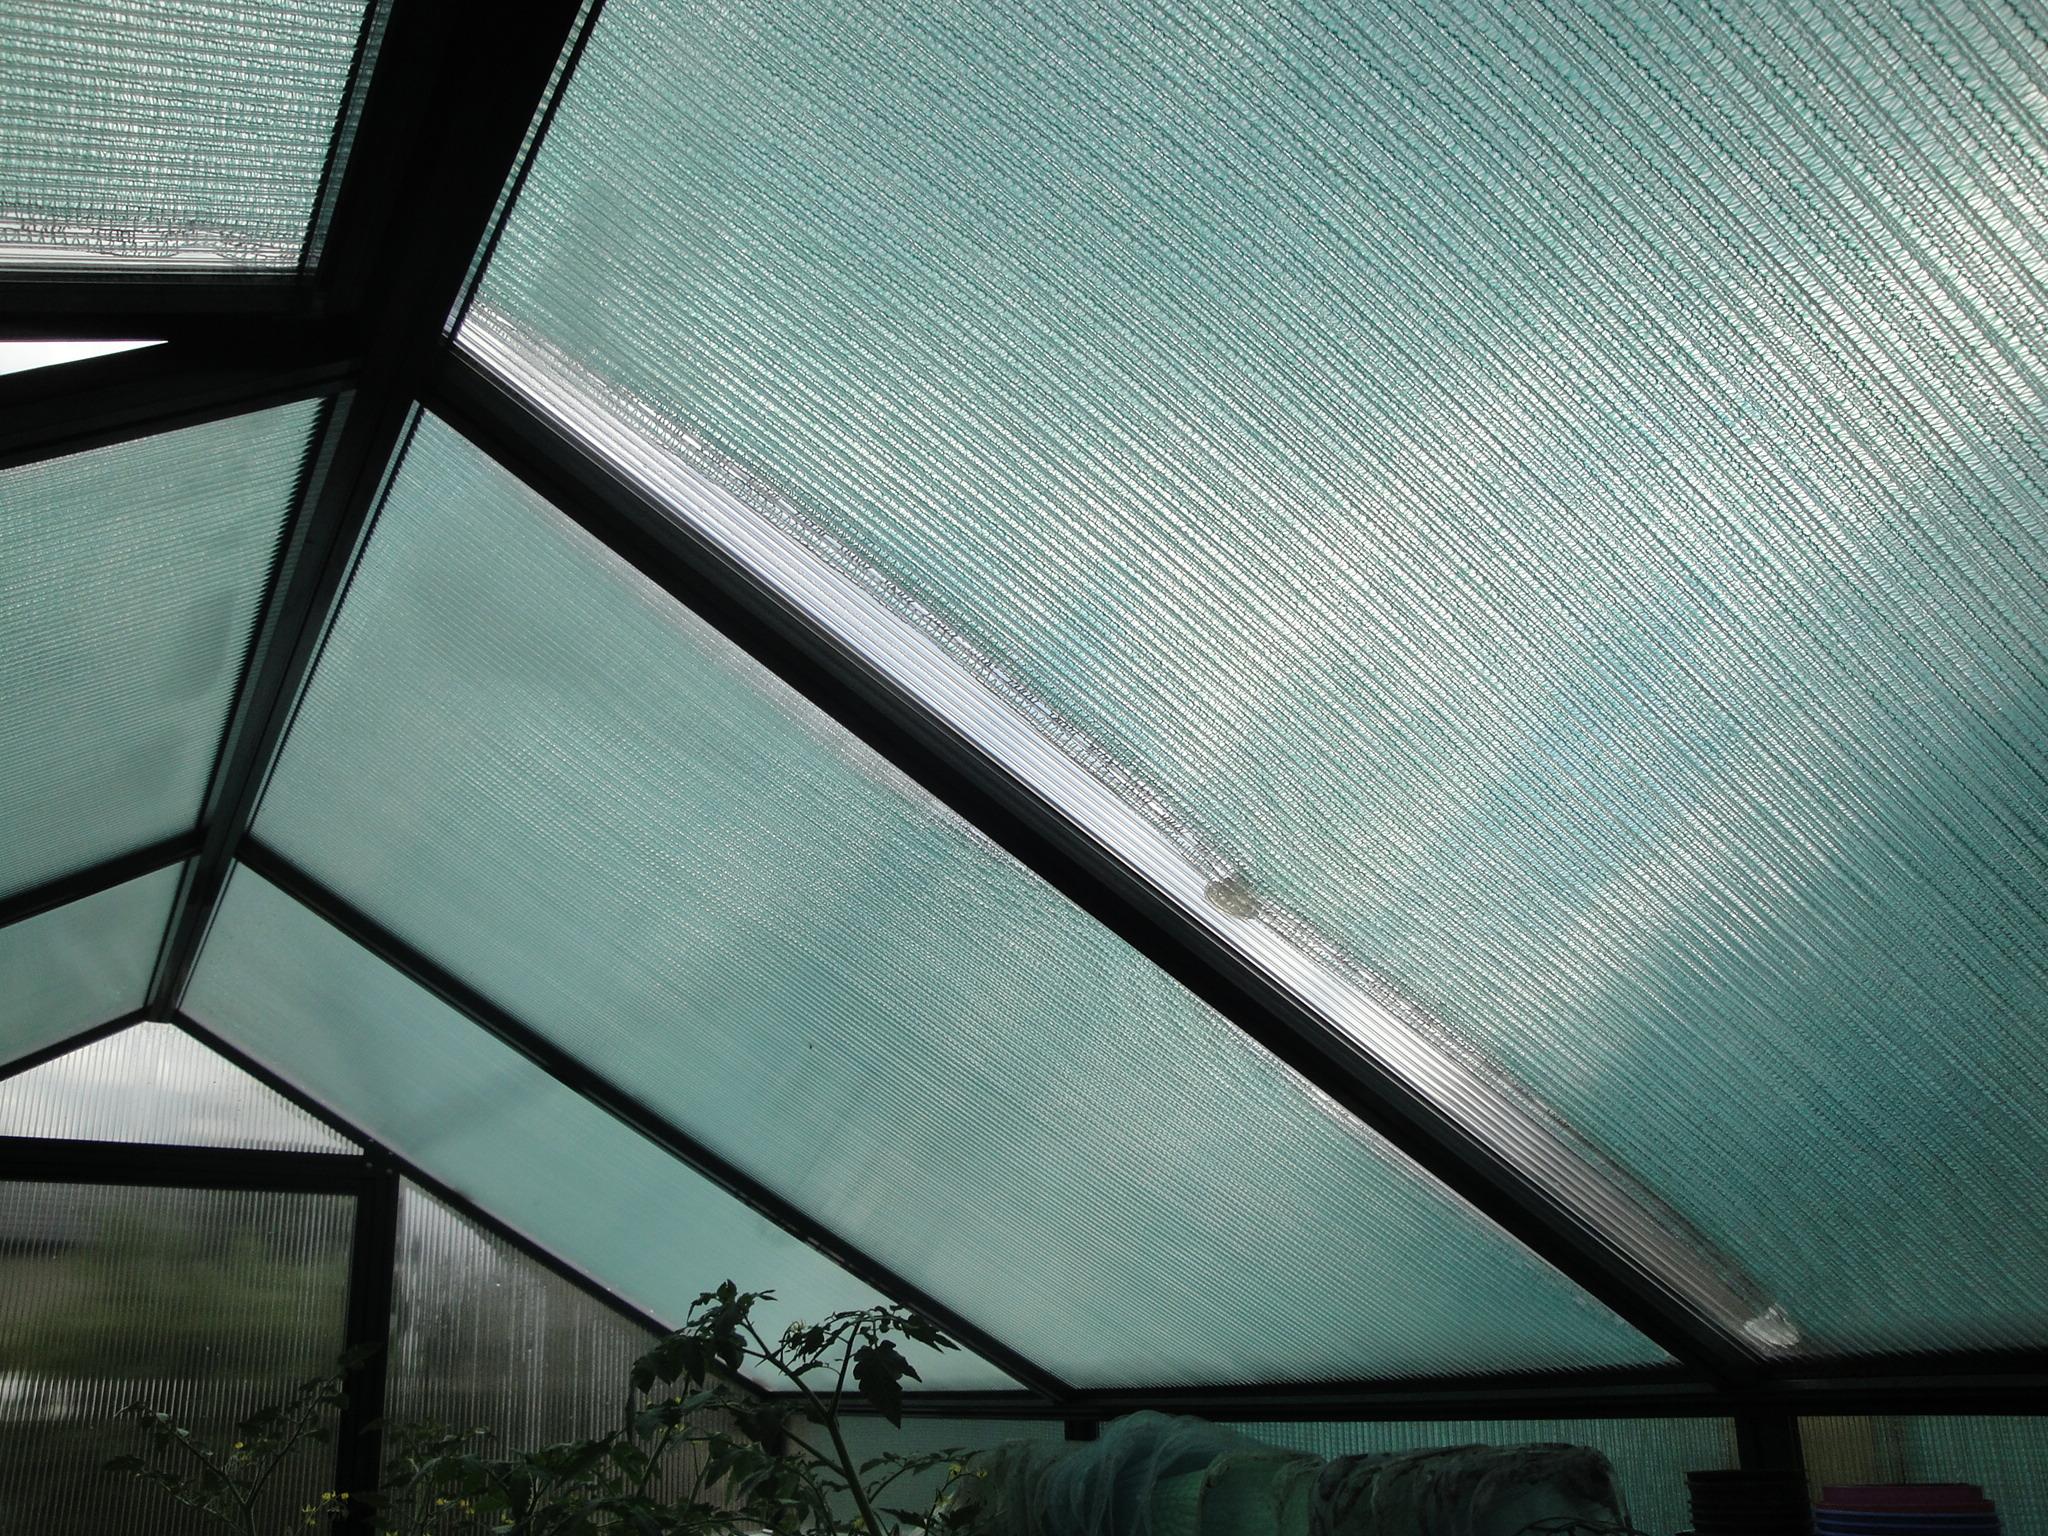 20 M Beschattung Schattiernetz Sonnenschutz